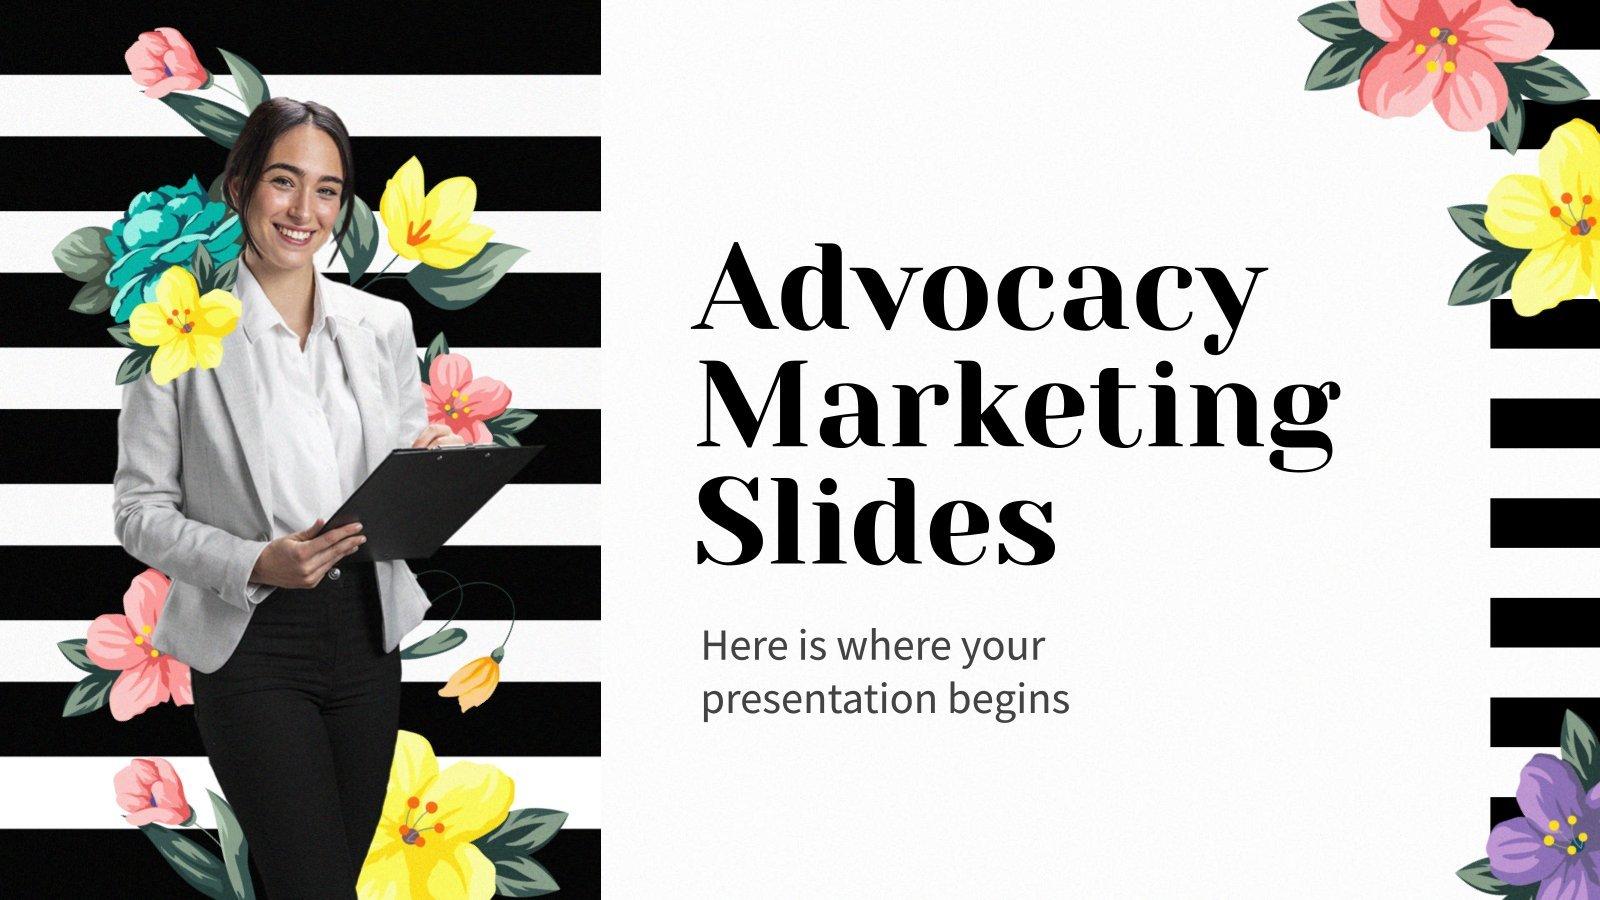 Advocacy Marketing Slides presentation template